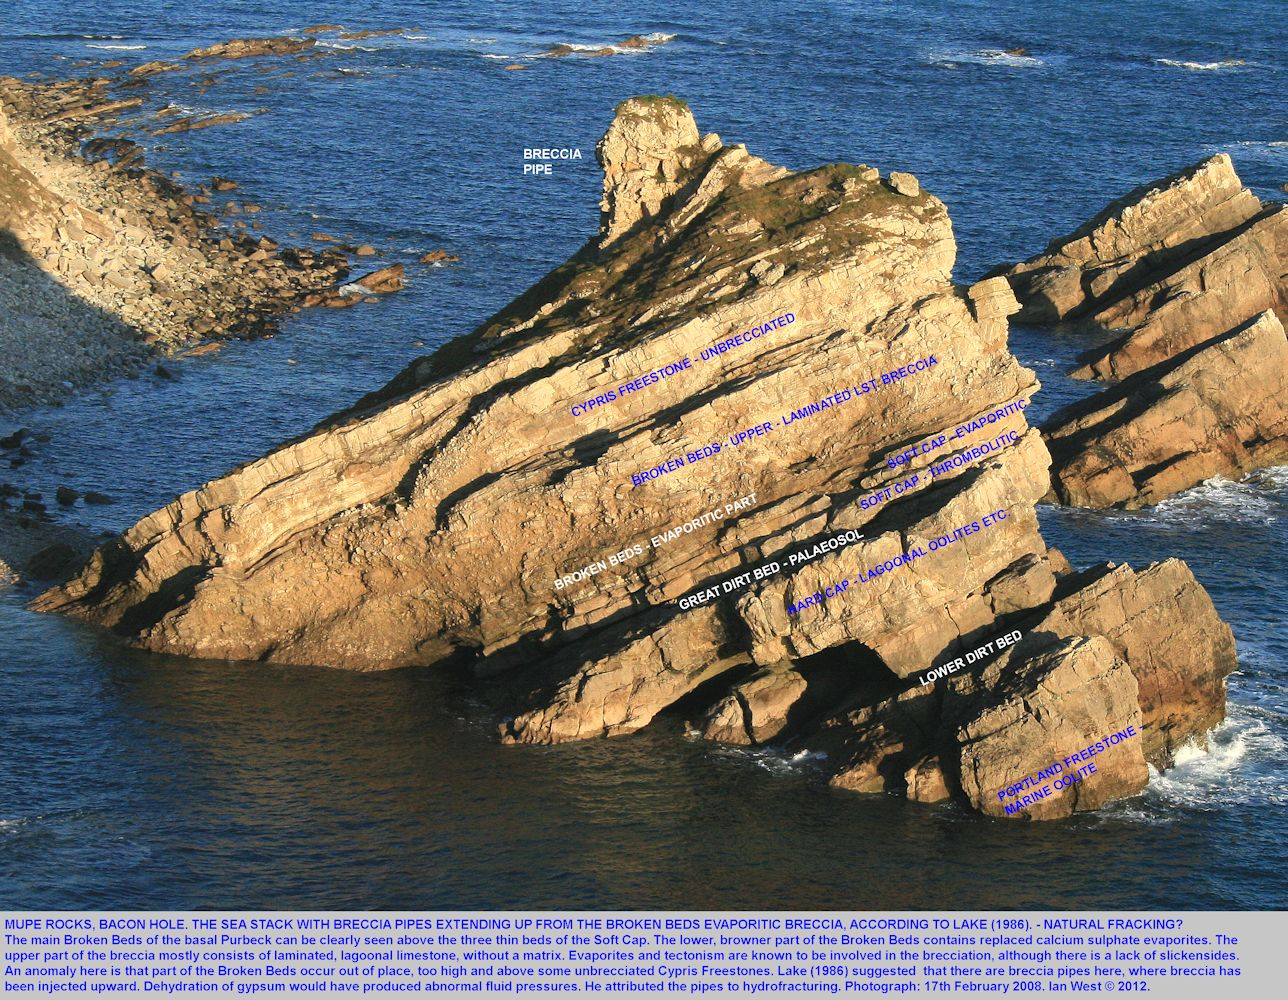 A breccia pipe of Lake (1986) in the basal Purbeck strata of a Mupe Rock, Mupe Bay, Dorset